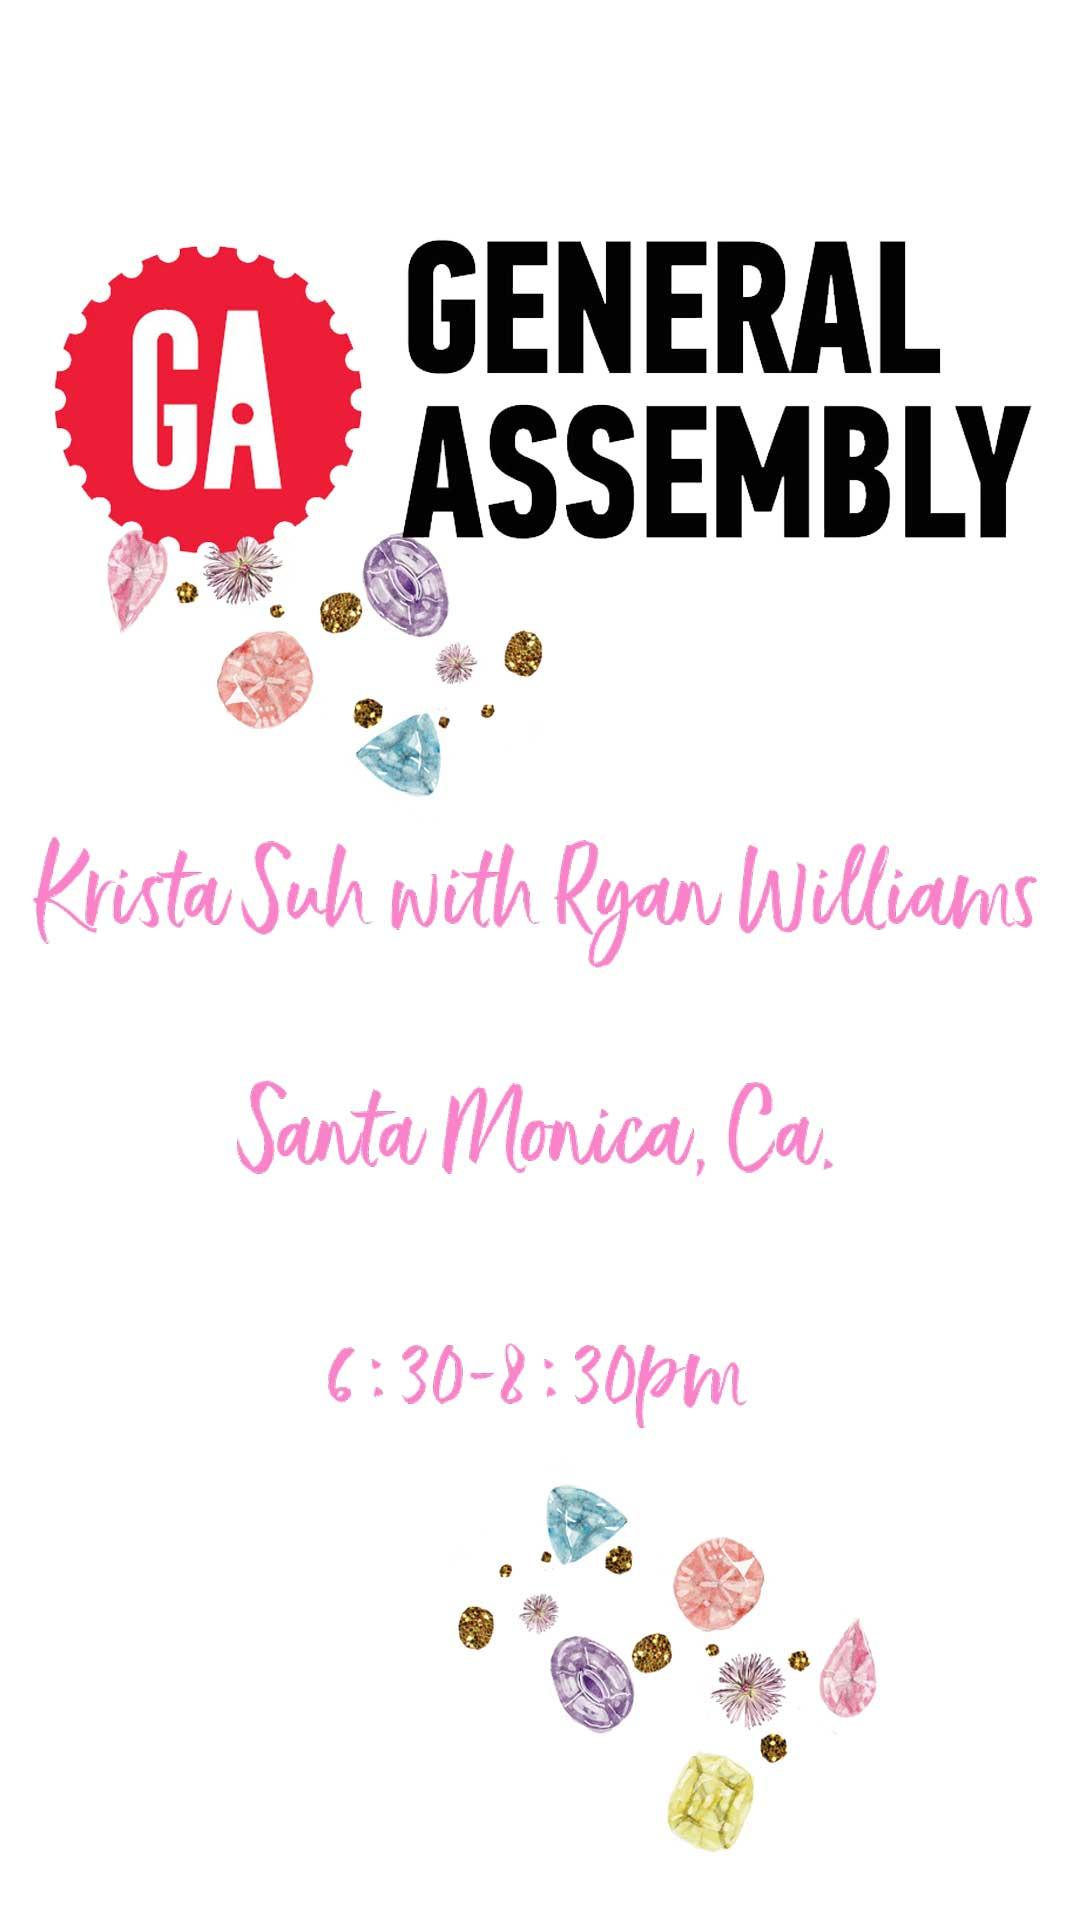 General Assembly Santa Monica